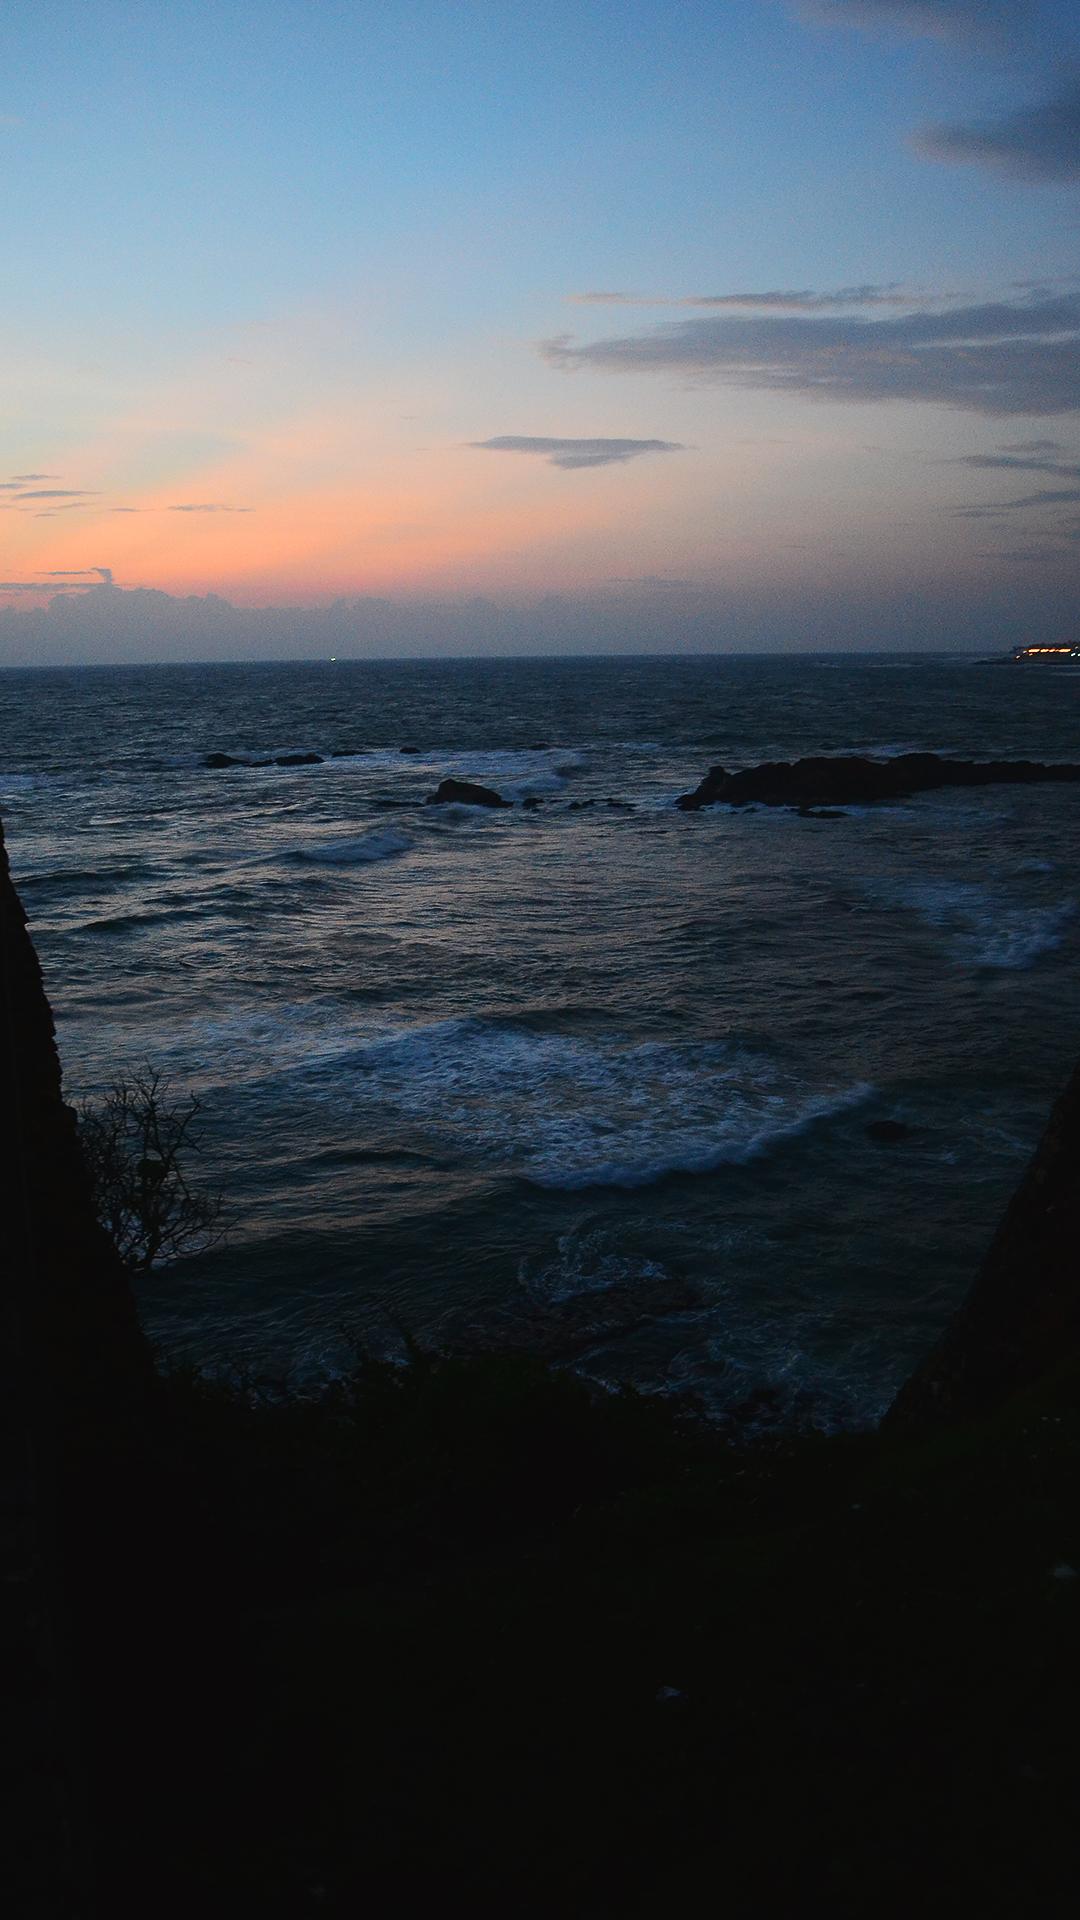 Sunset sobre el Océano Índico.